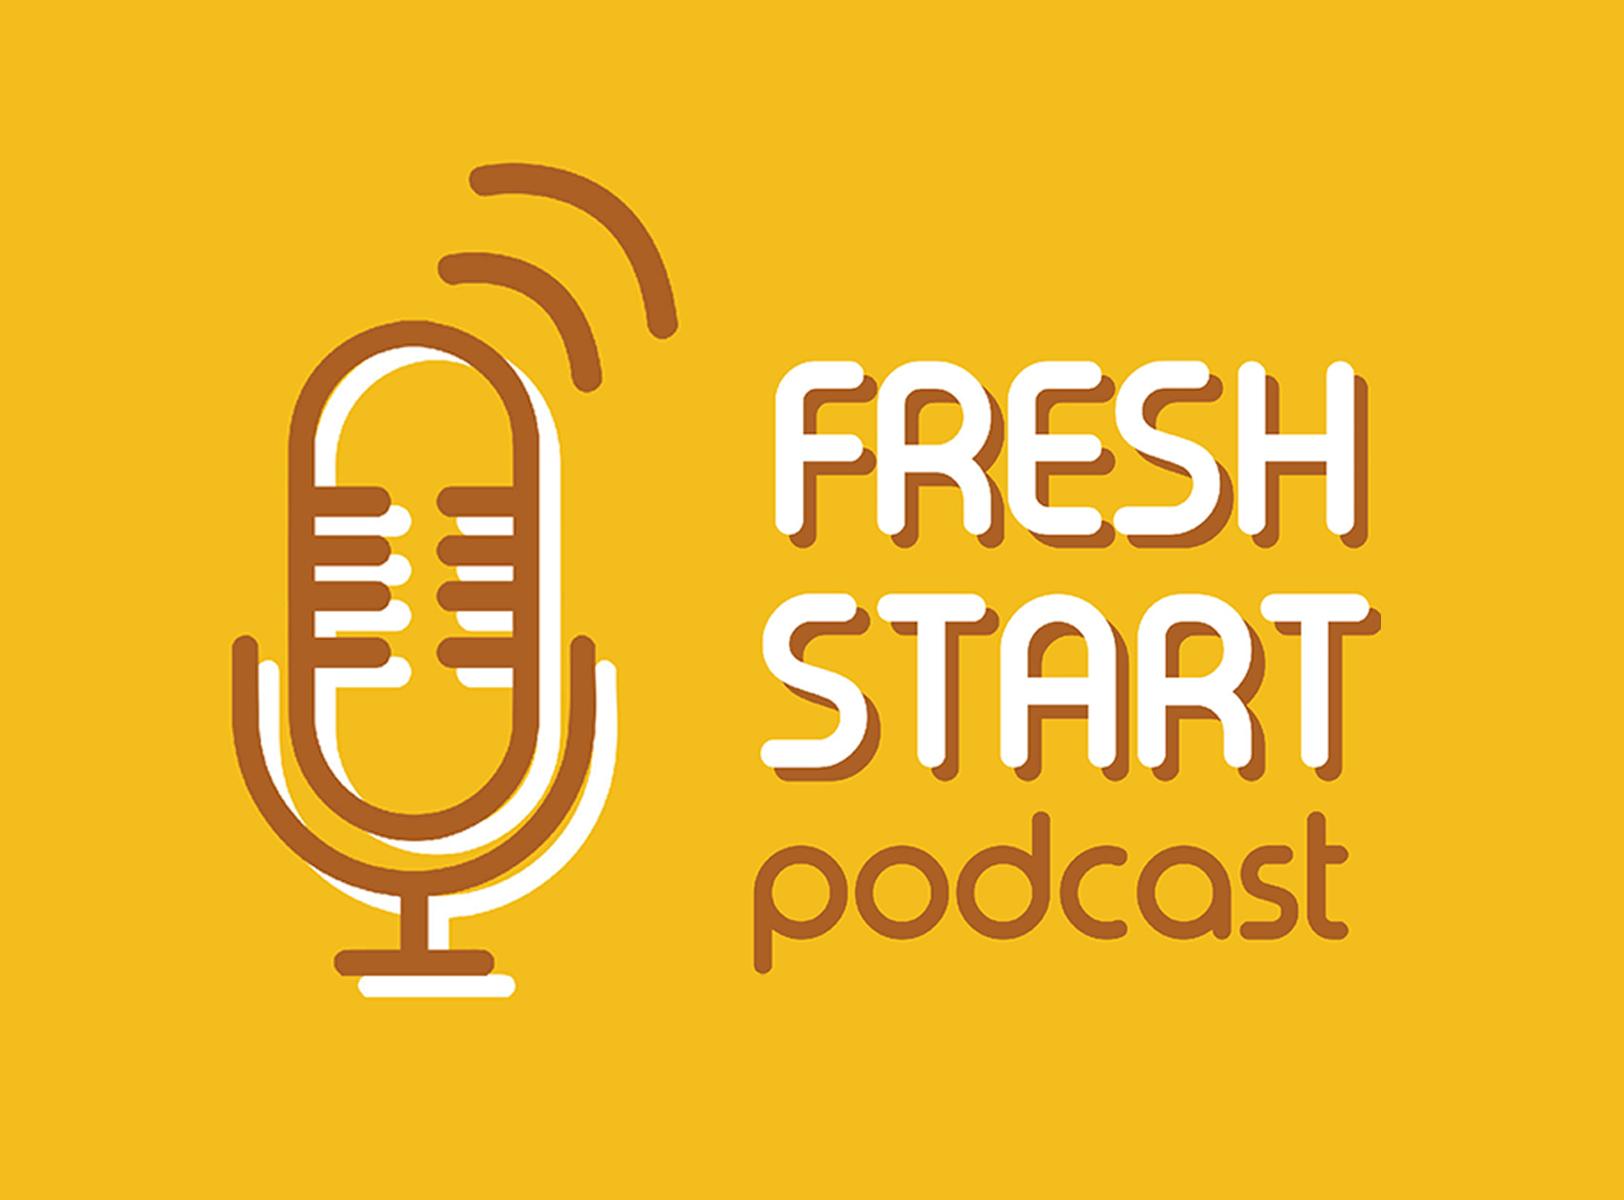 Fresh Start: Podcast News (5/6/2019 Mon.)